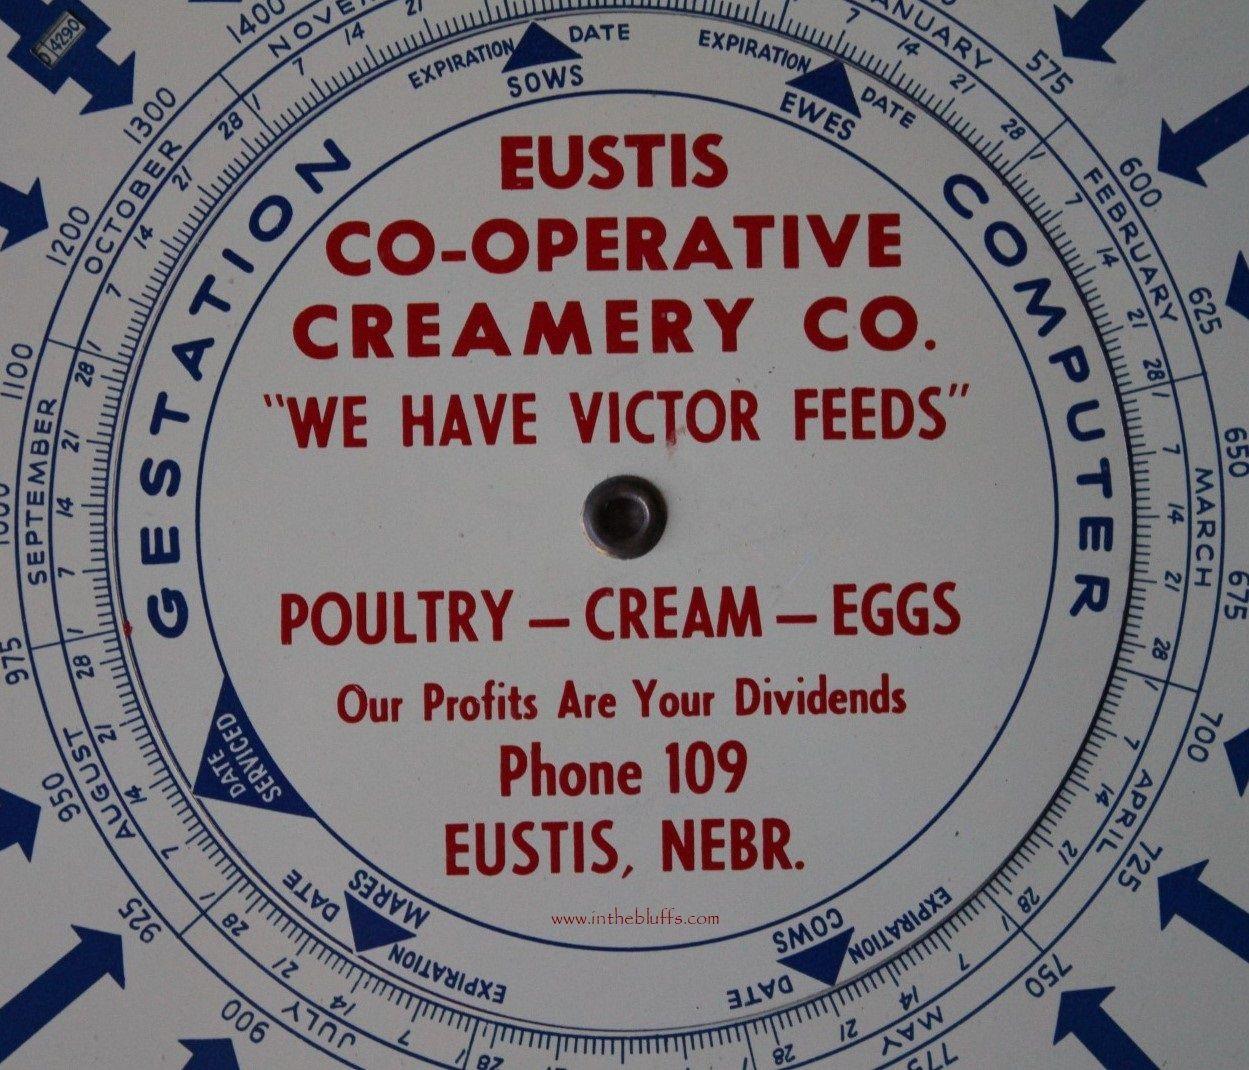 Etsy Shop In 2020 Advertising Collectibles Etsy Shop Etsy Vintage